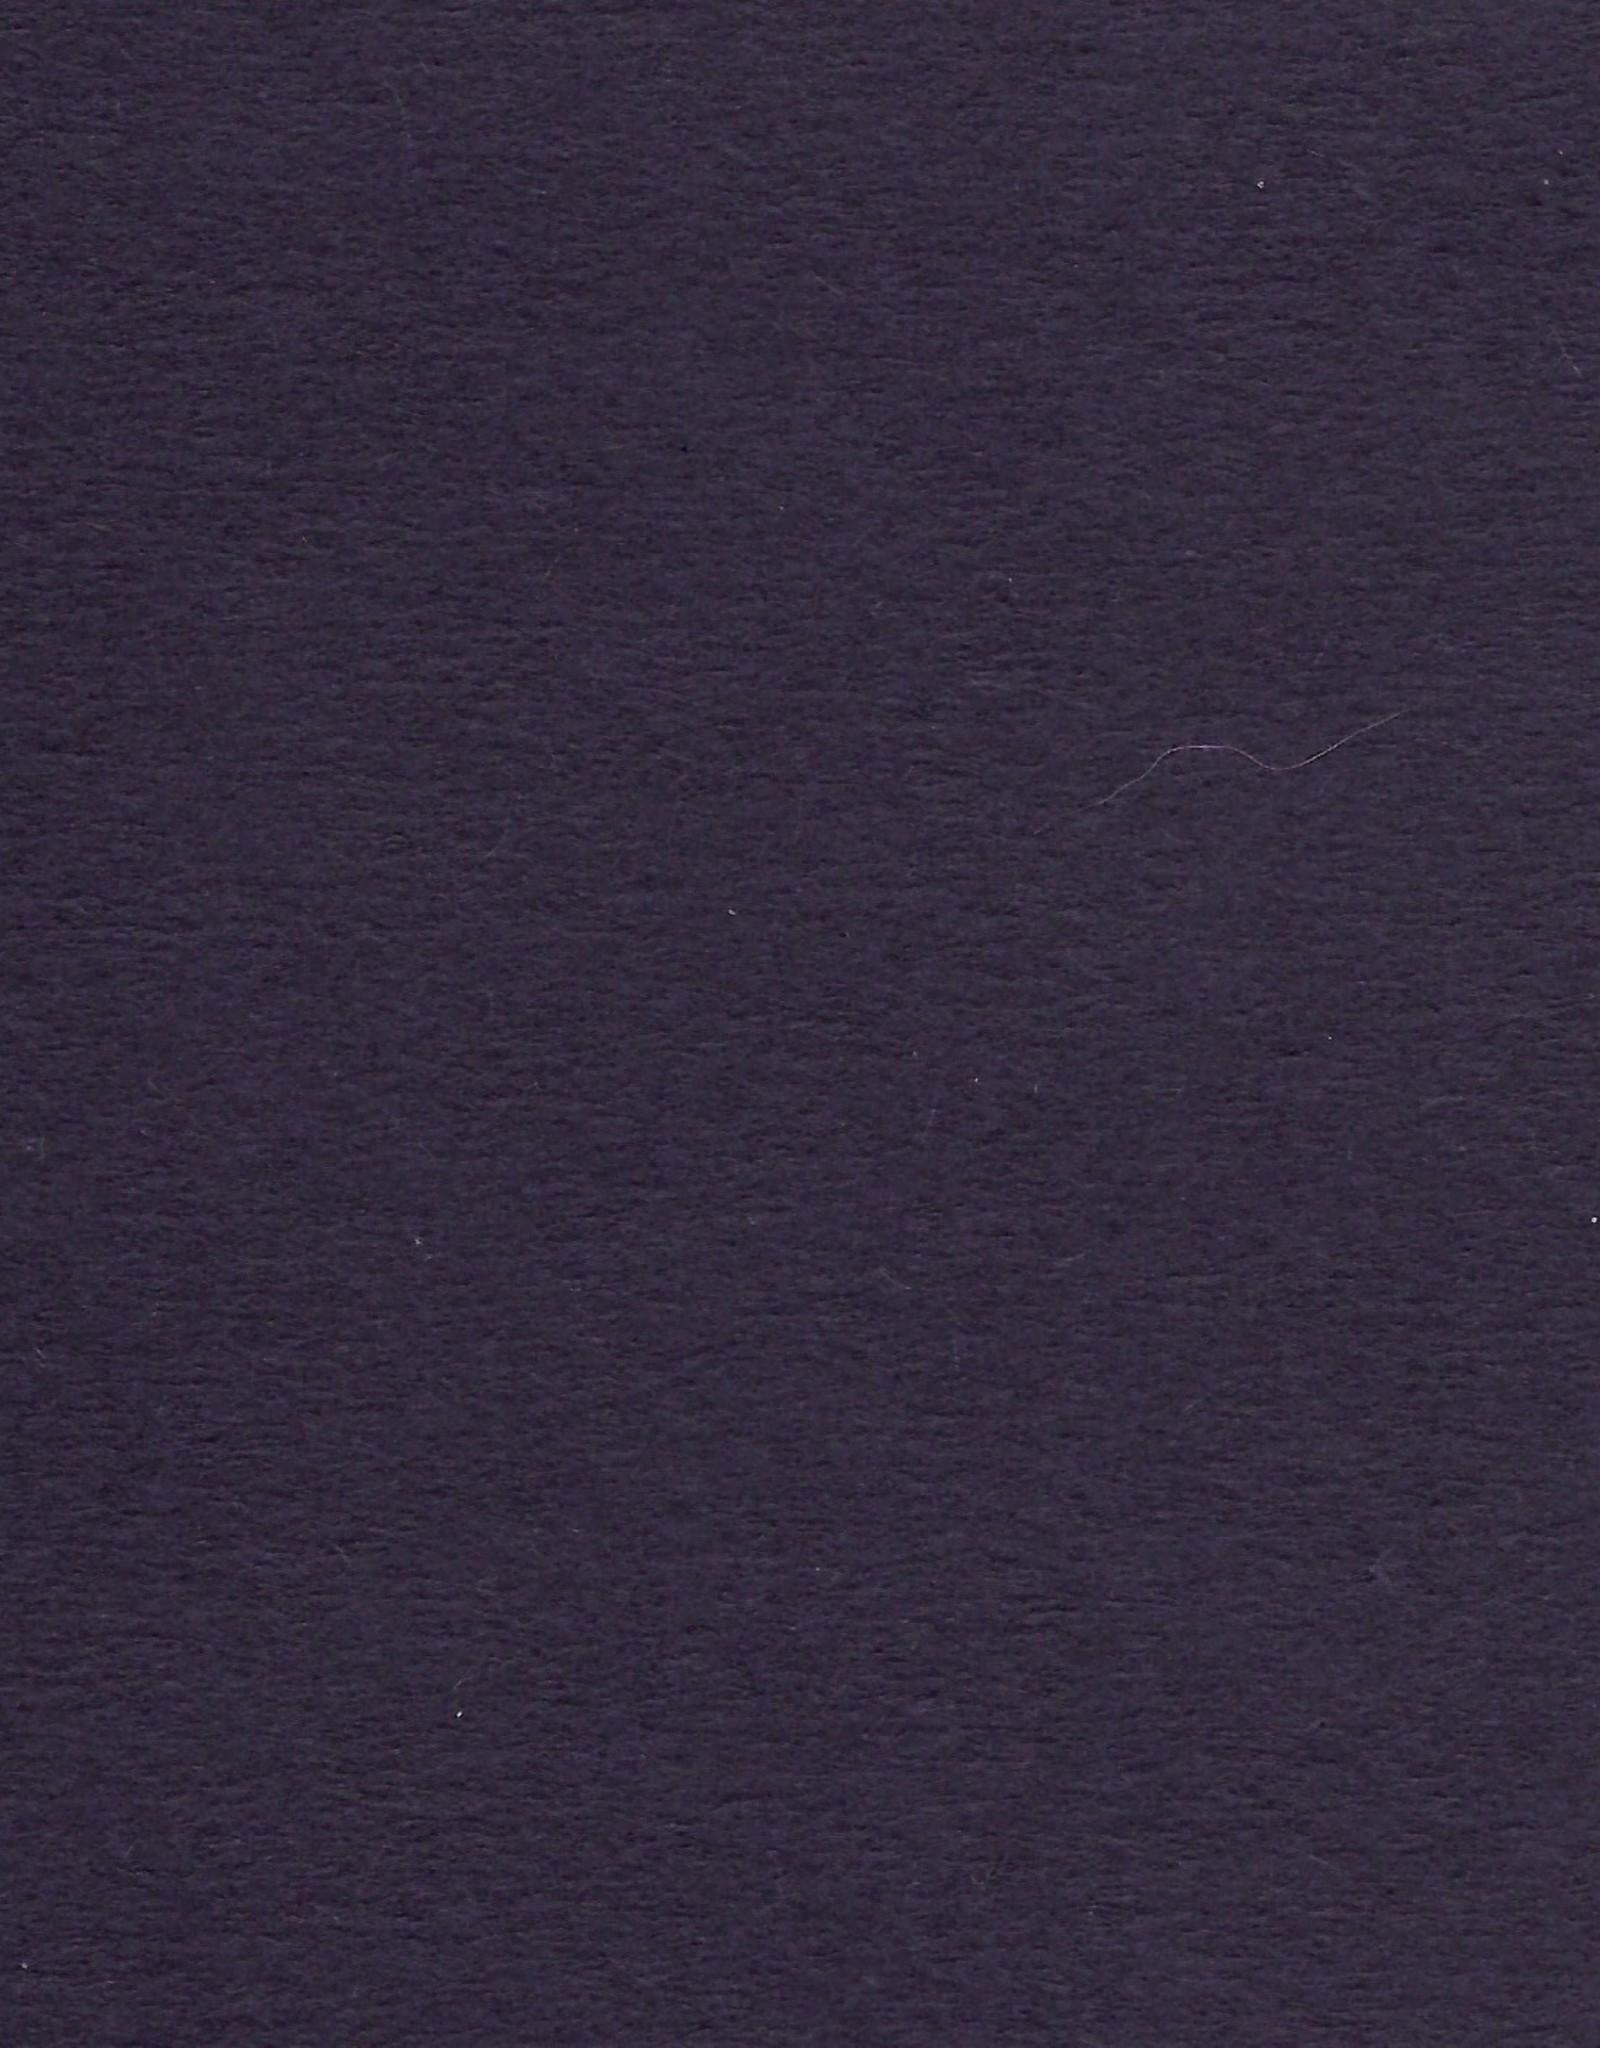 "Colorplan, 91#, Text, Amethyst, 25"" x 38"", 135 gsm"